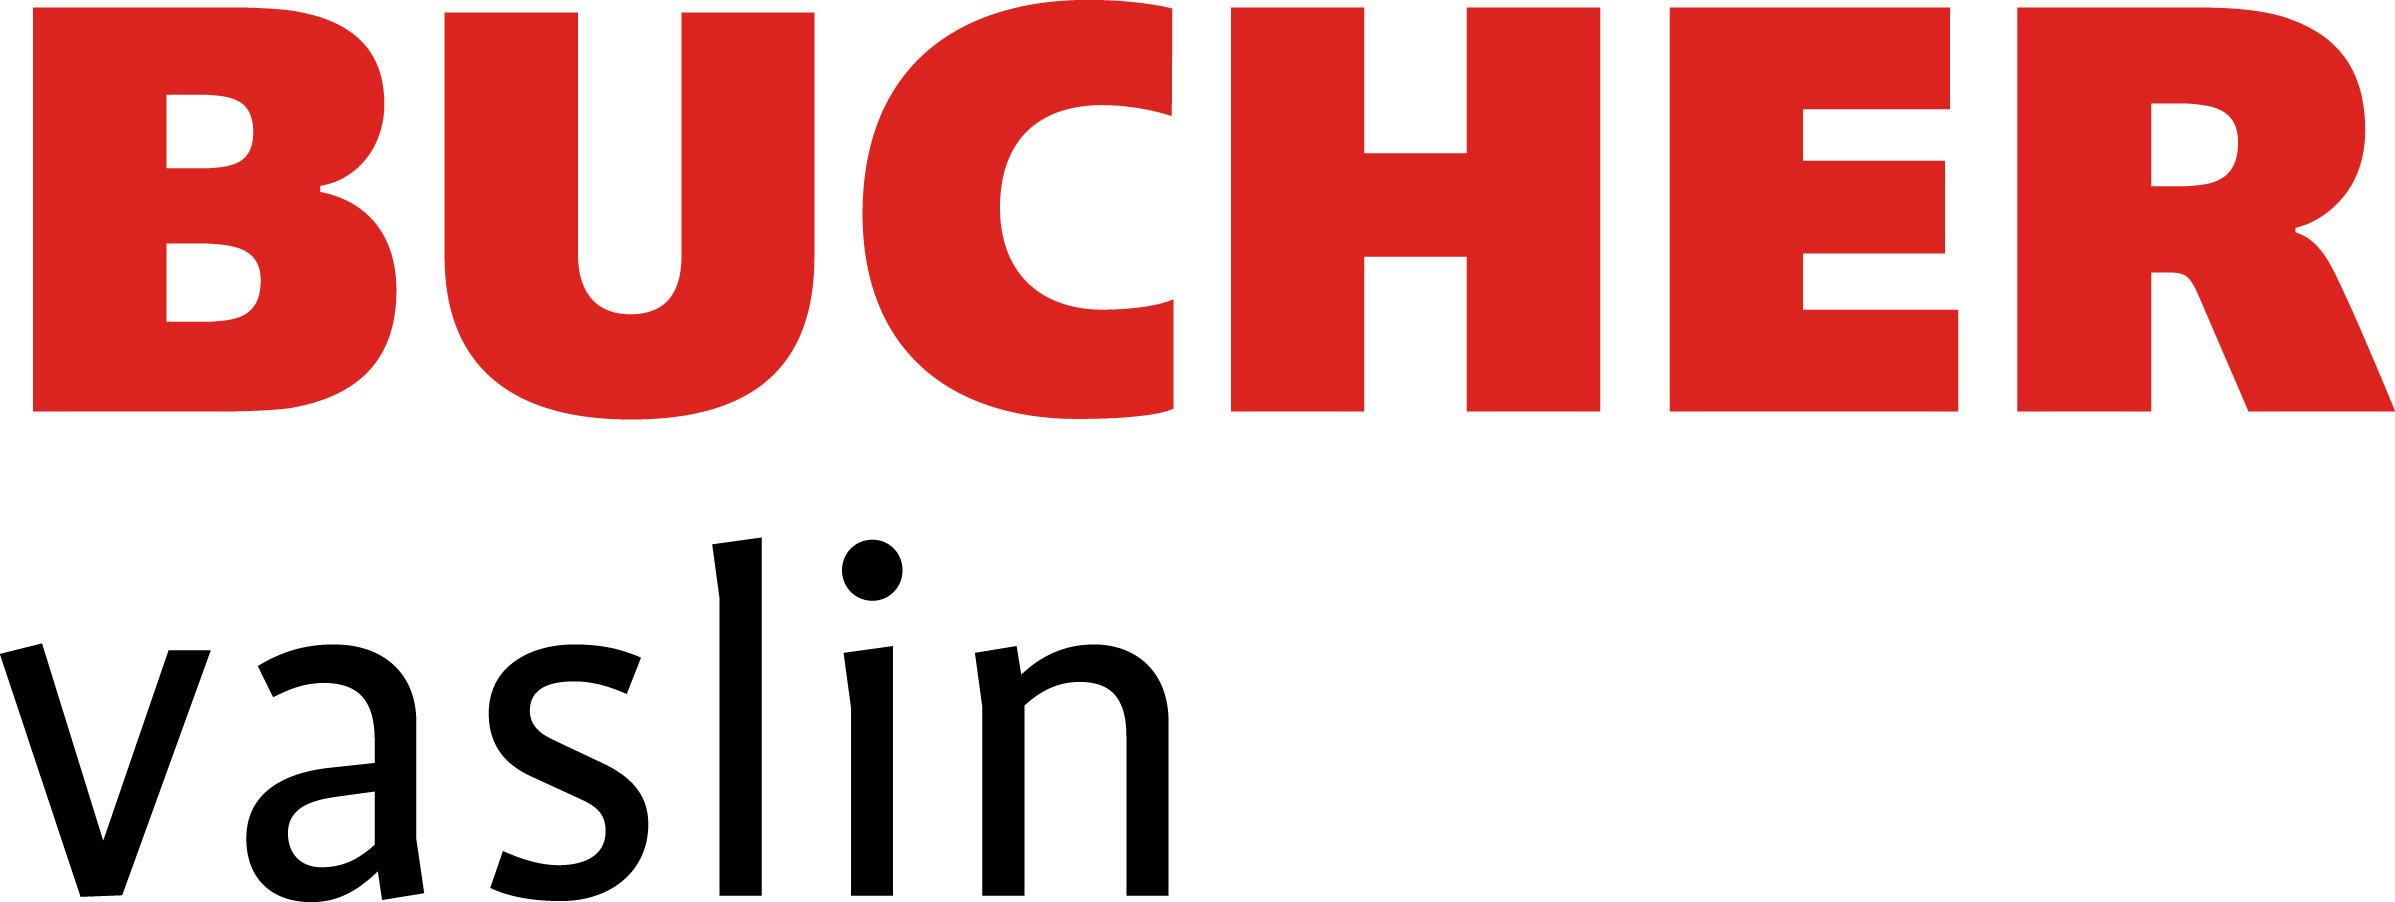 Bucher Vaslin logo